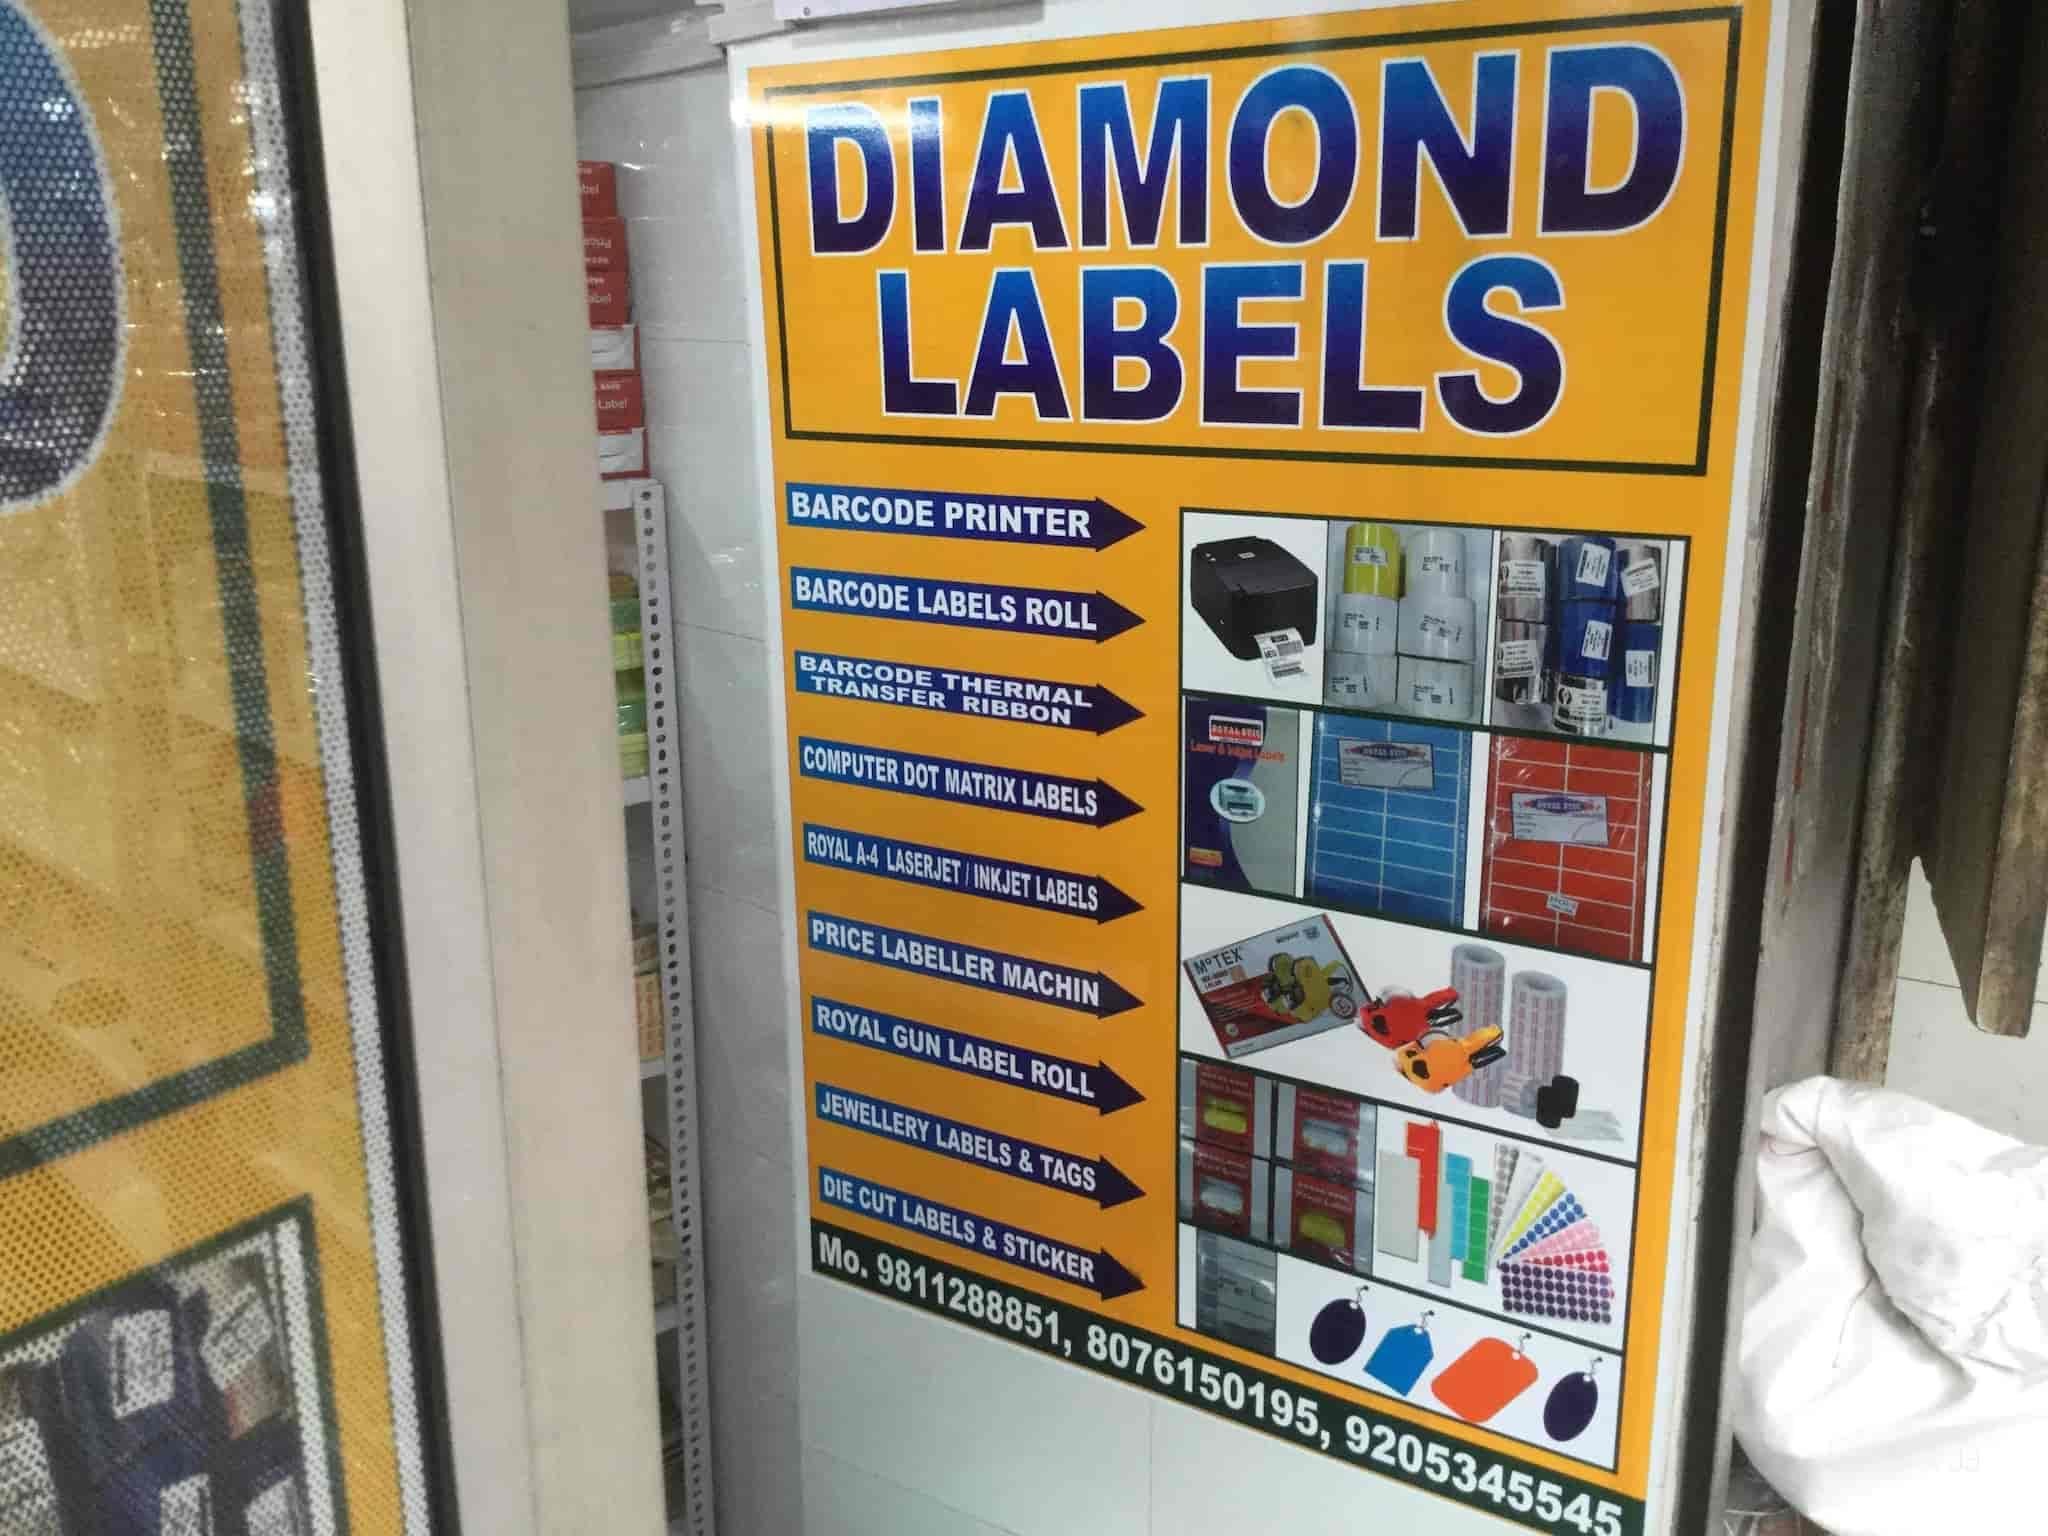 Diamond Lables And Sationers, Nai Sarak - Sticker